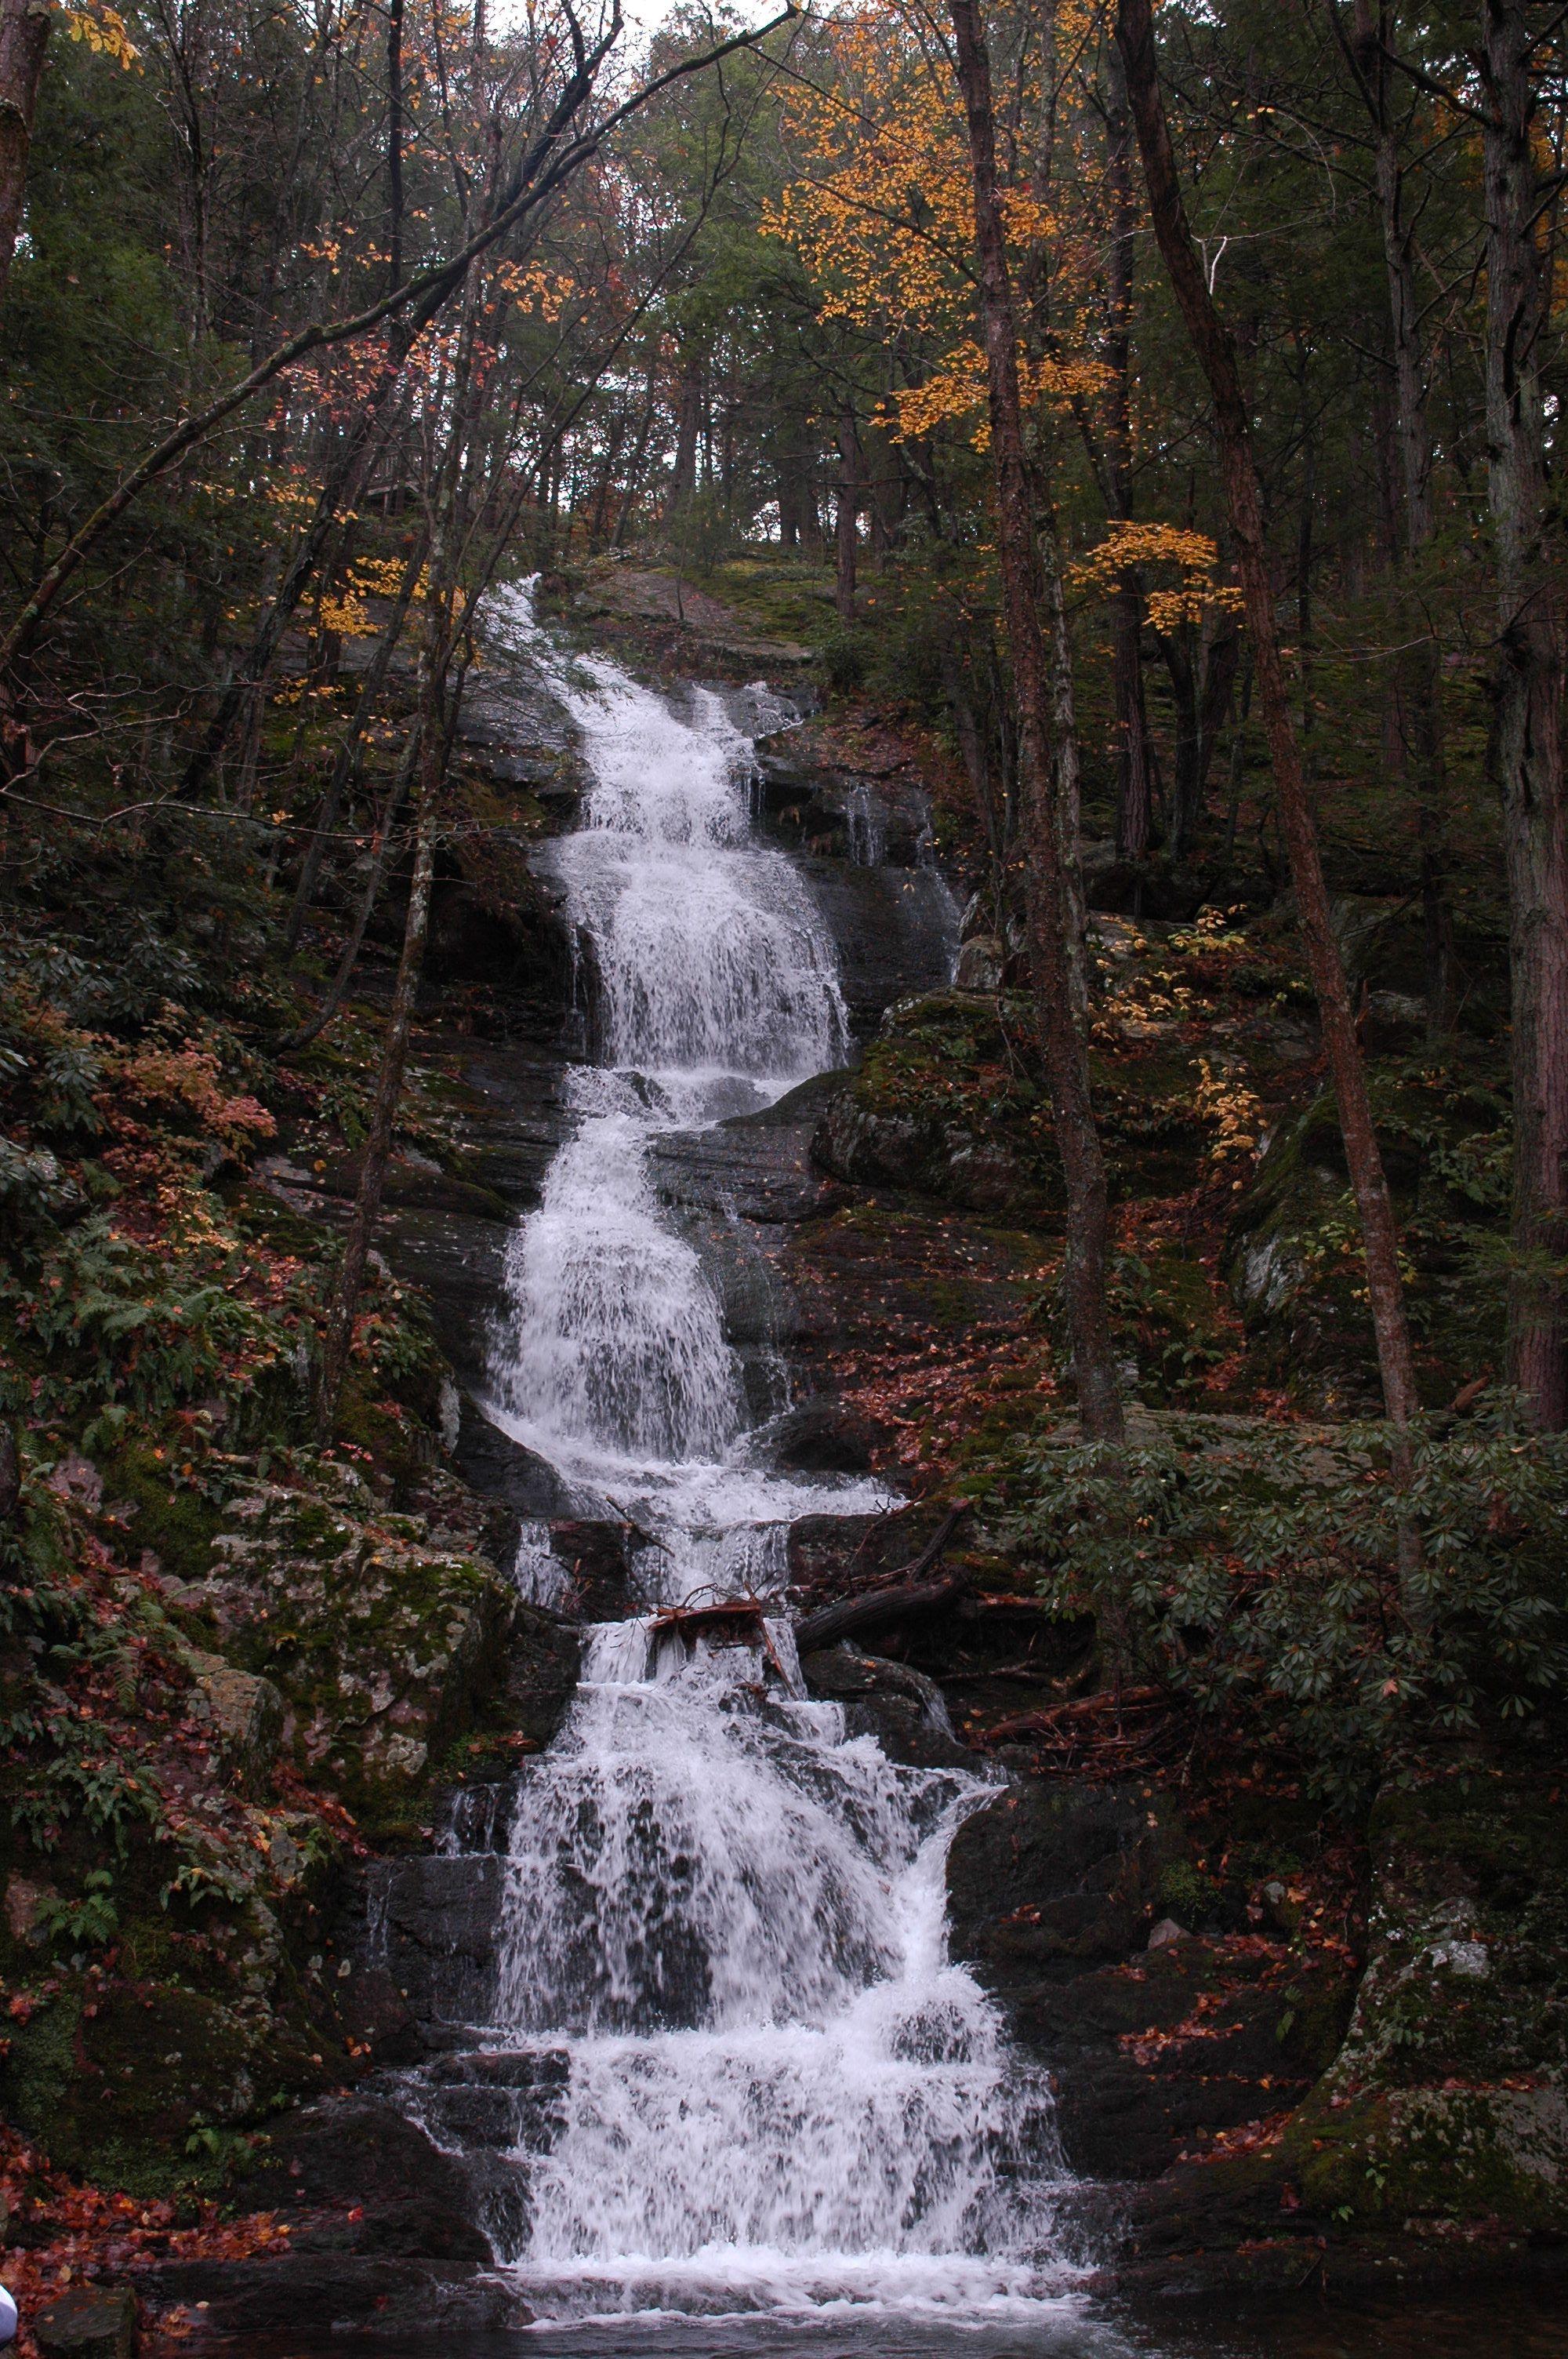 Buttermilk Falls, Kittatinny Mountain, NJ | Pocono waterfalls in